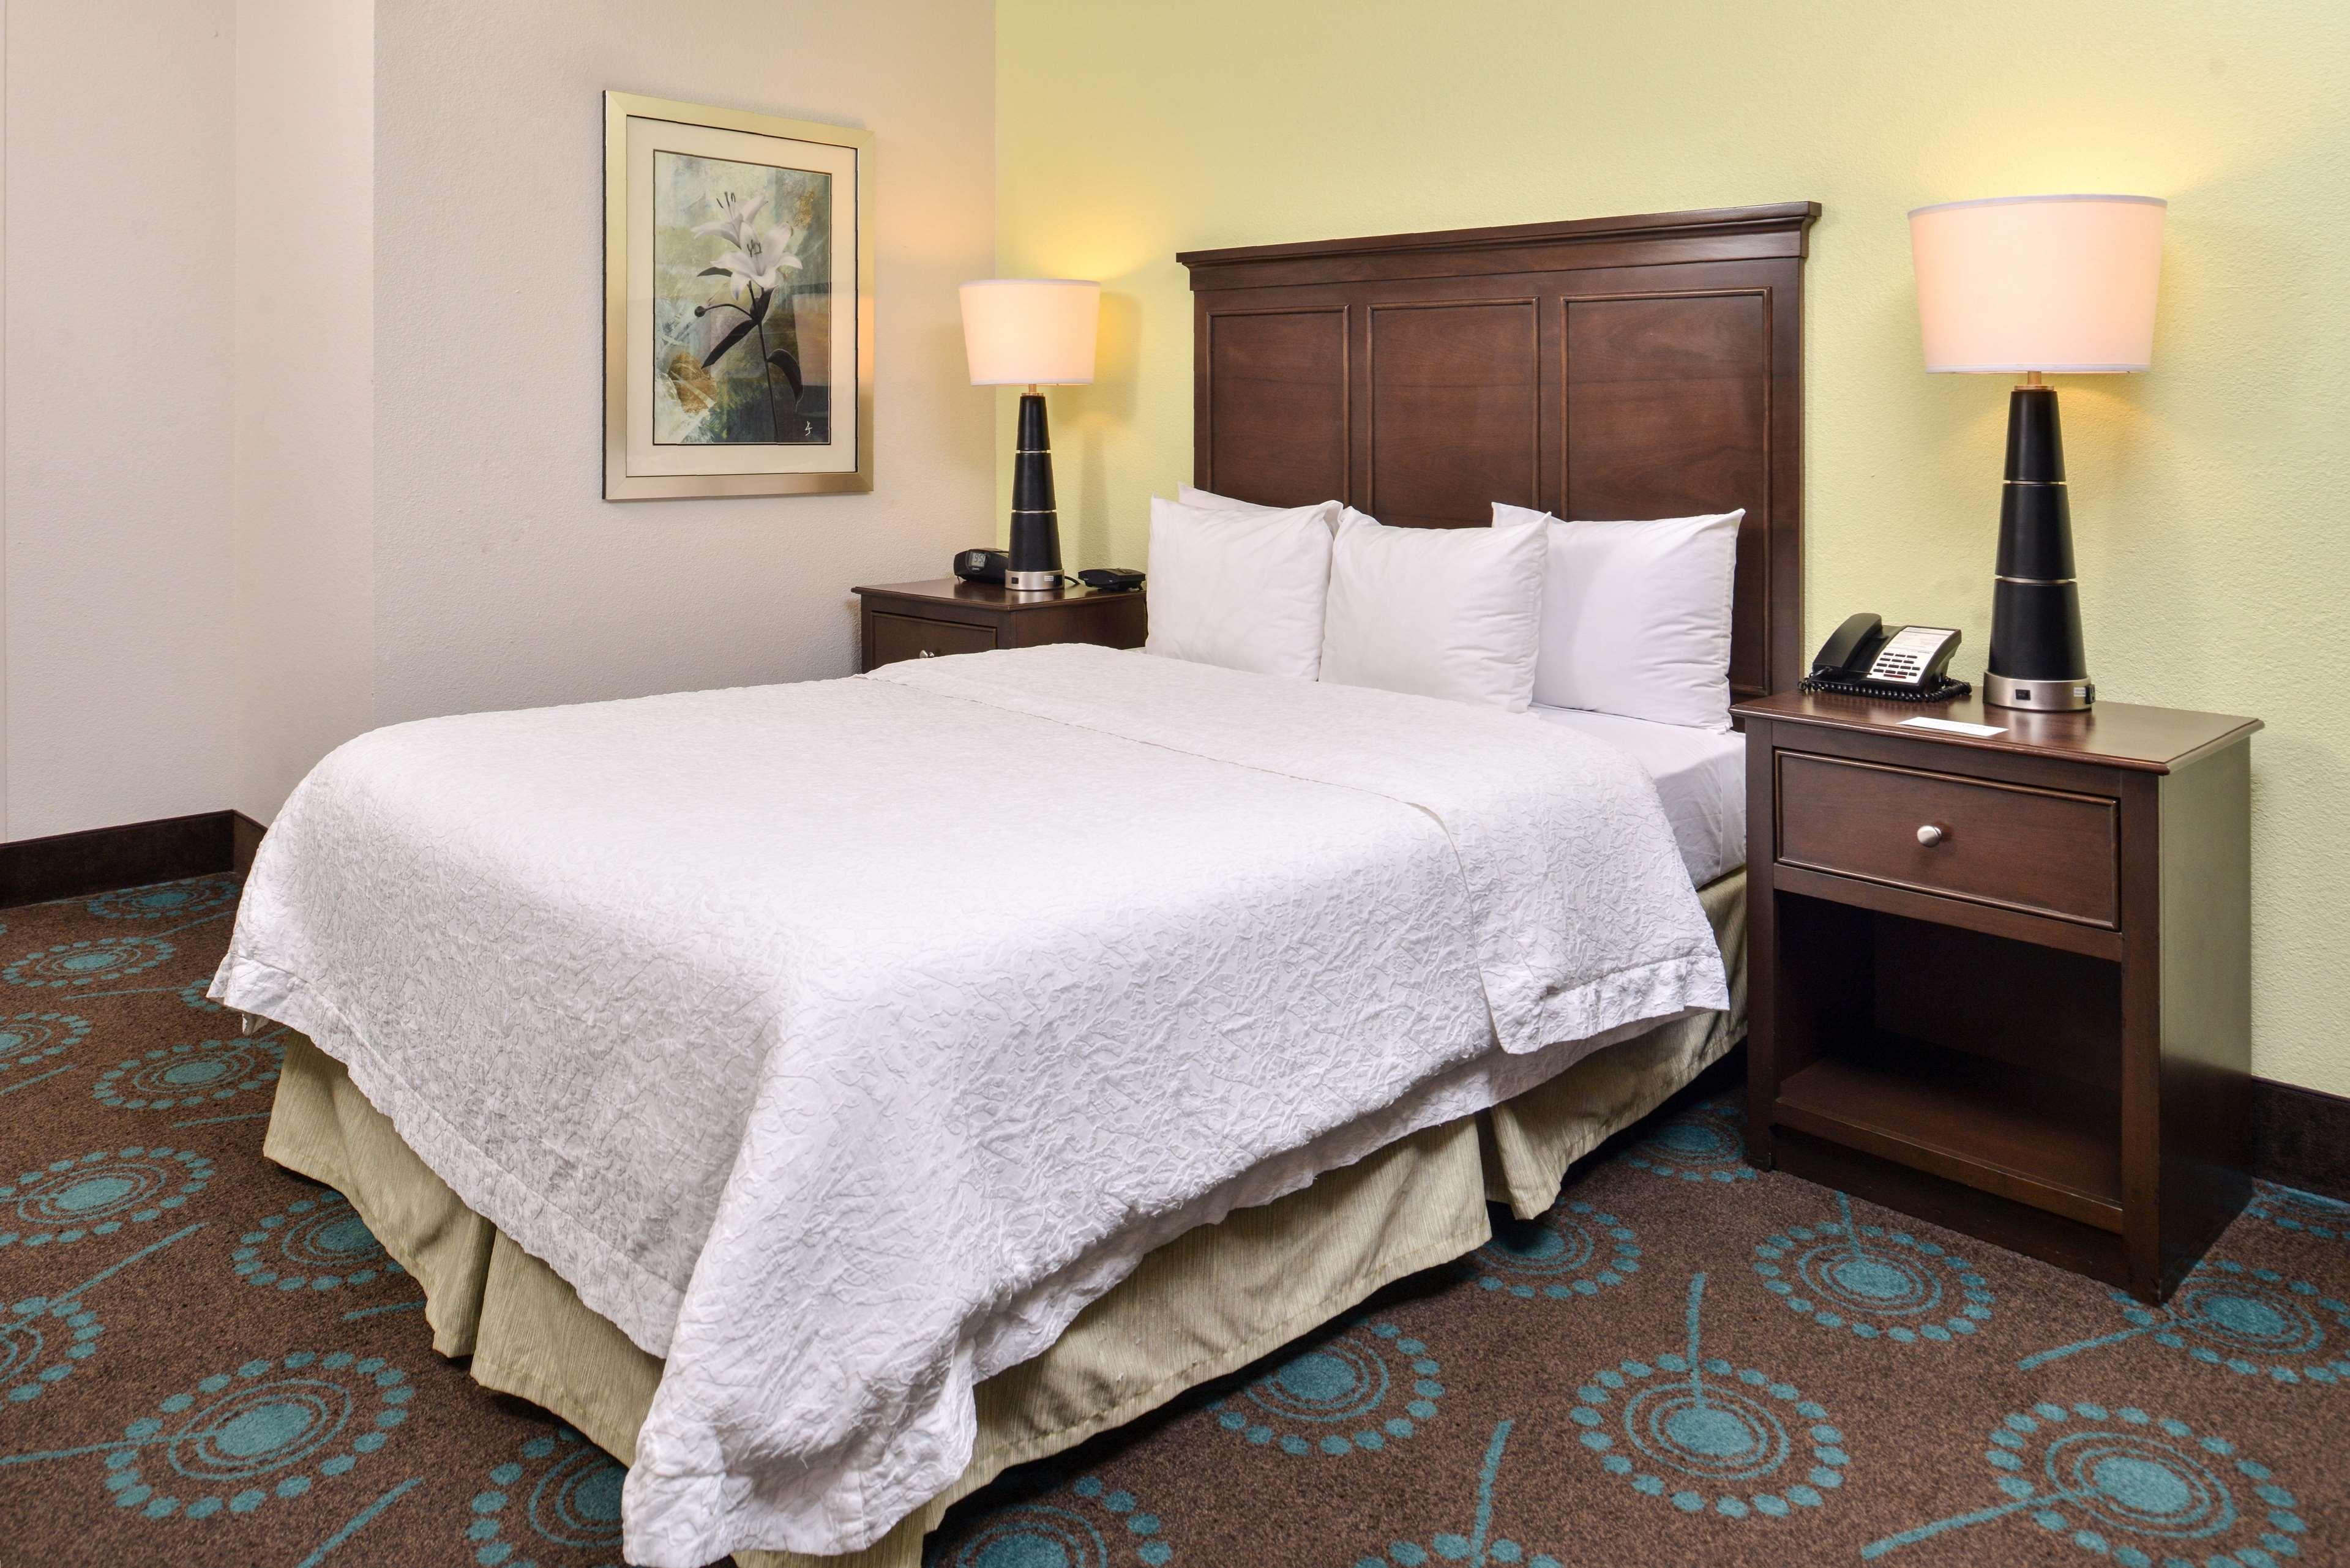 Hampton Inn & Suites Newport News (Oyster Point) image 30